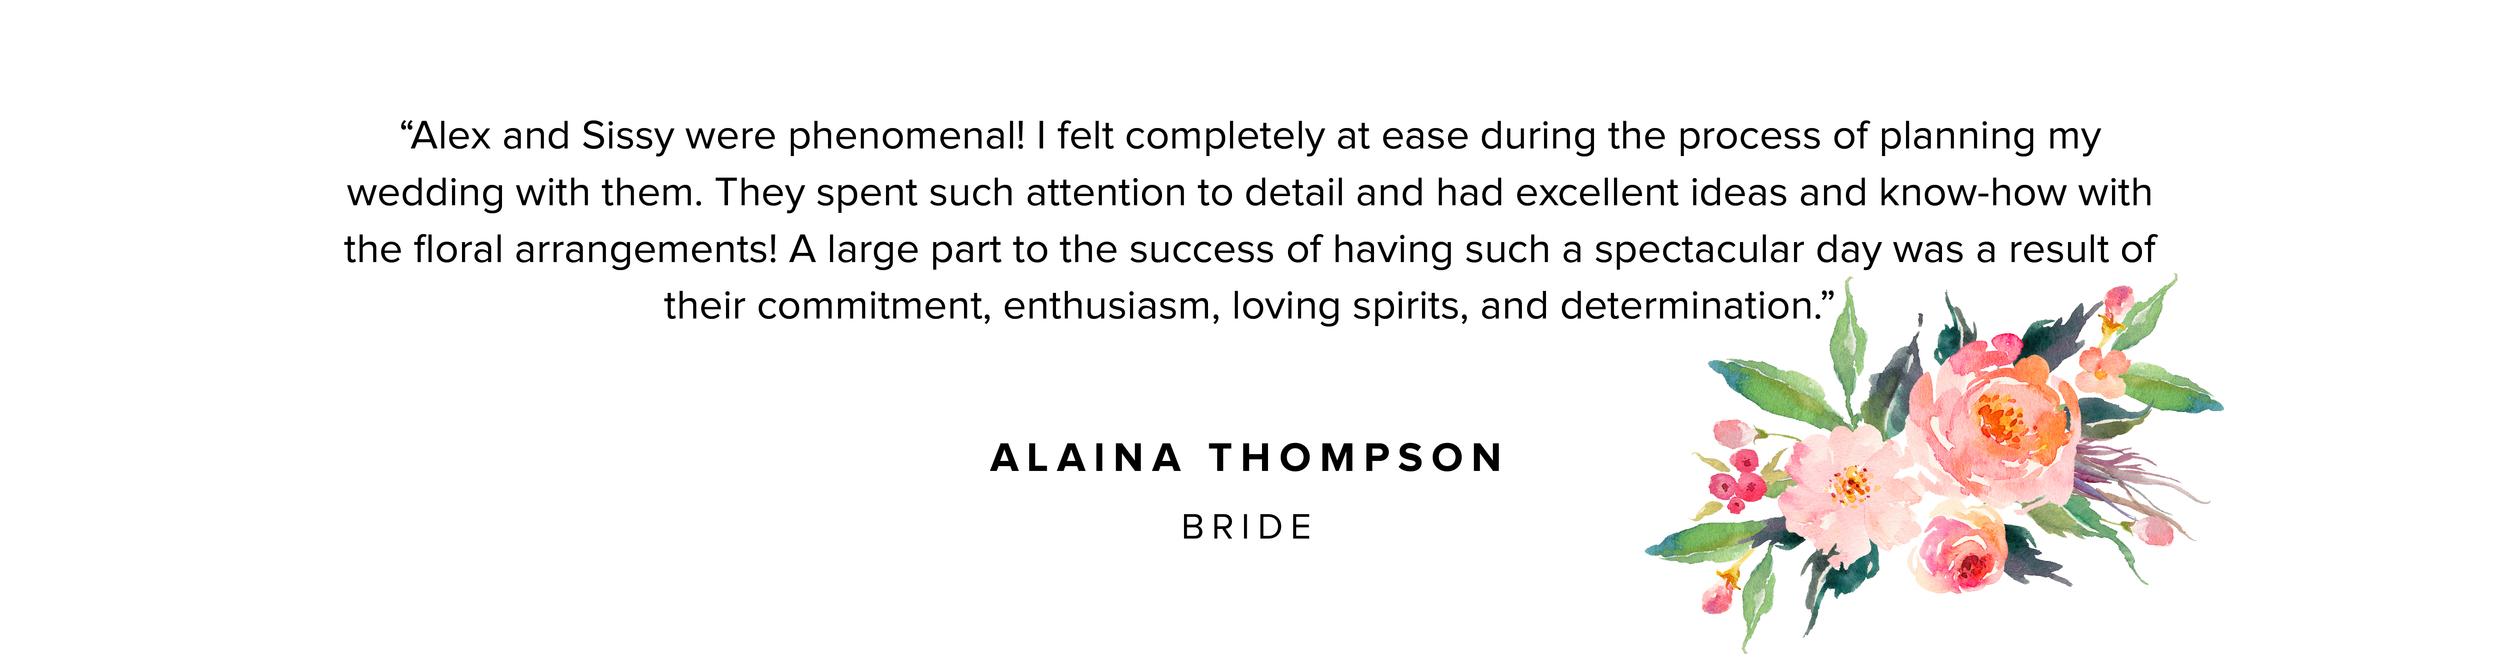 Review_Alaina Thompson.jpg